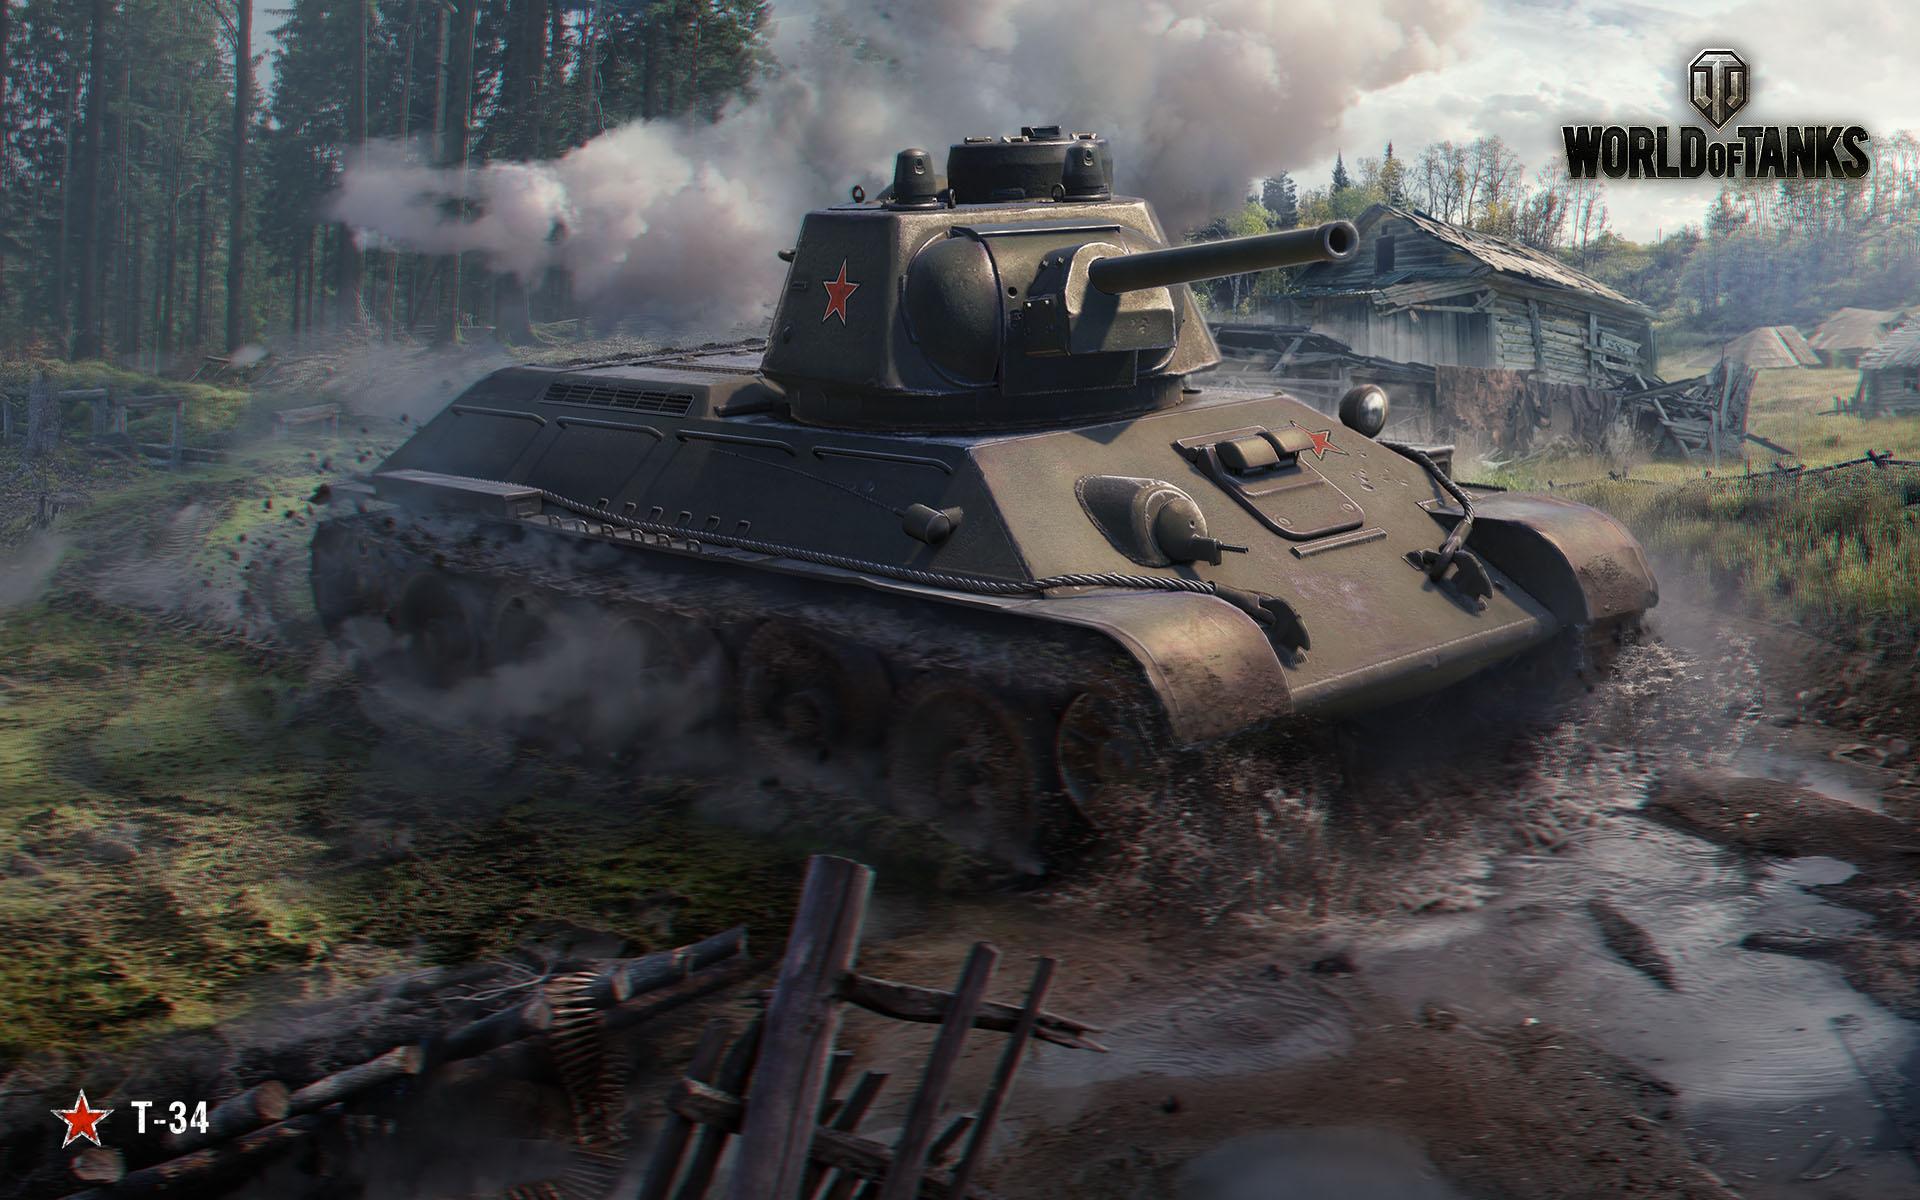 1920x1080 обои на рабочий стол world of tanks 6